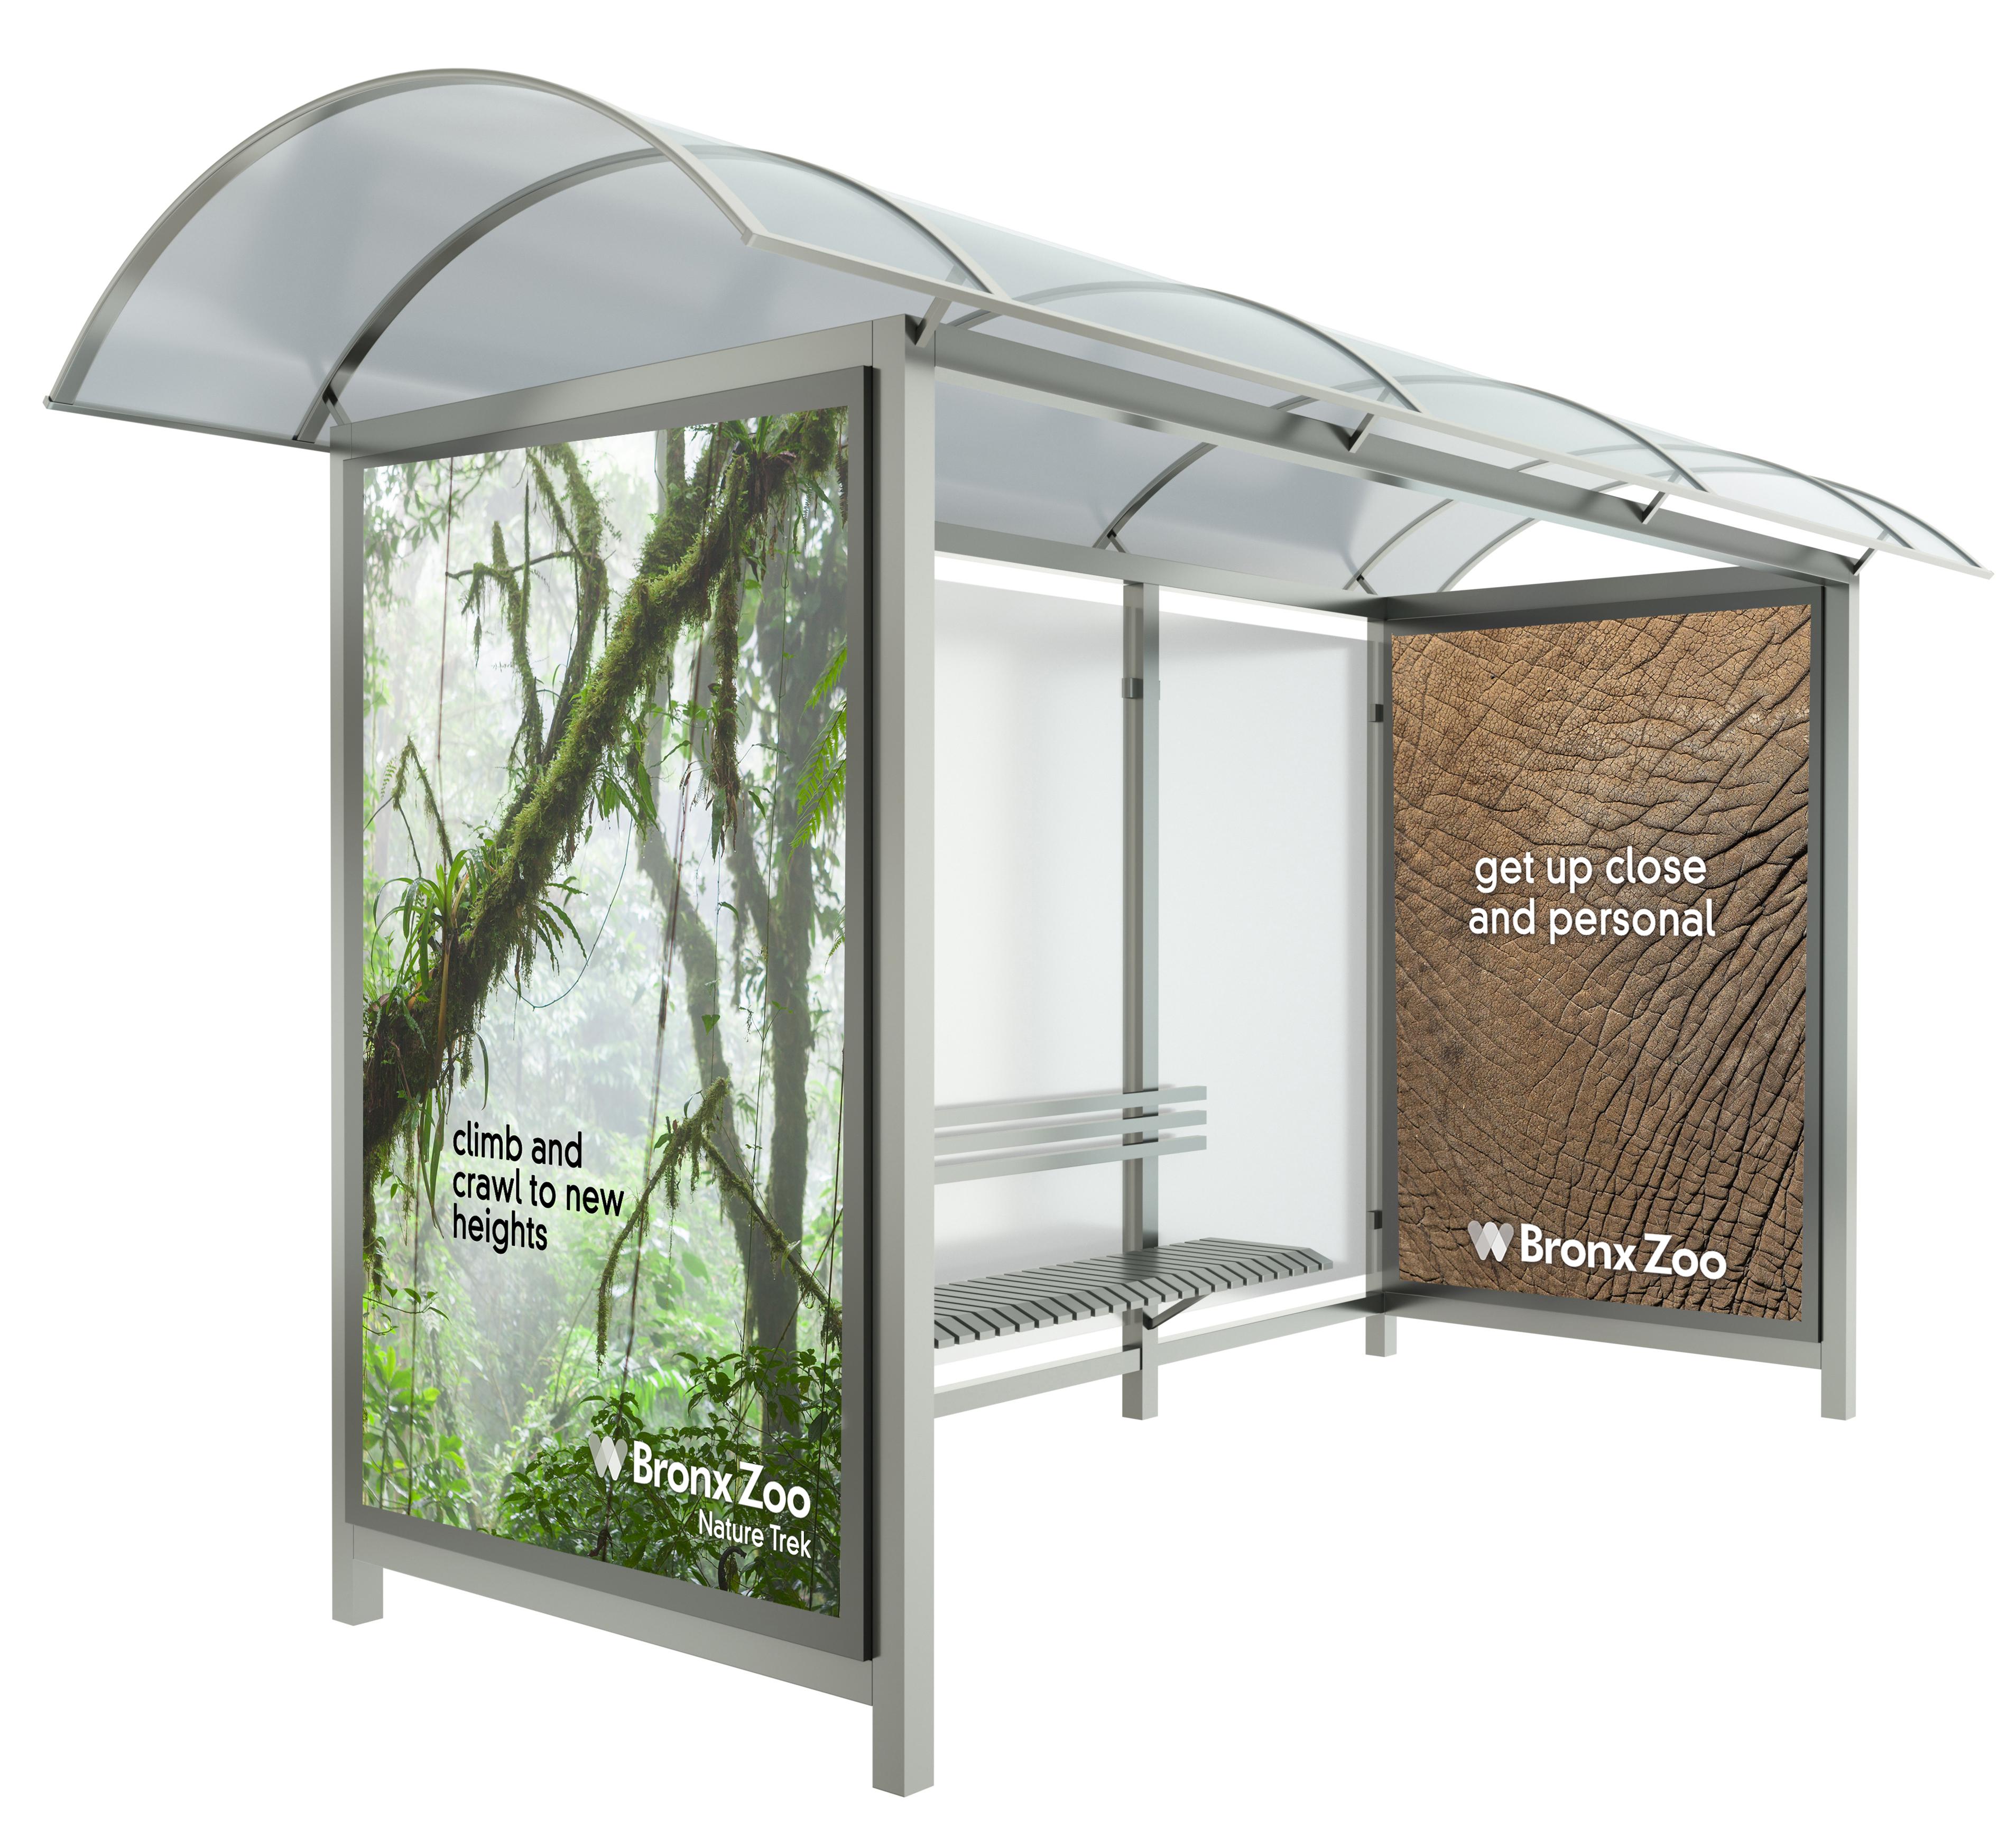 Bronx Zool Transit Shelter Ad